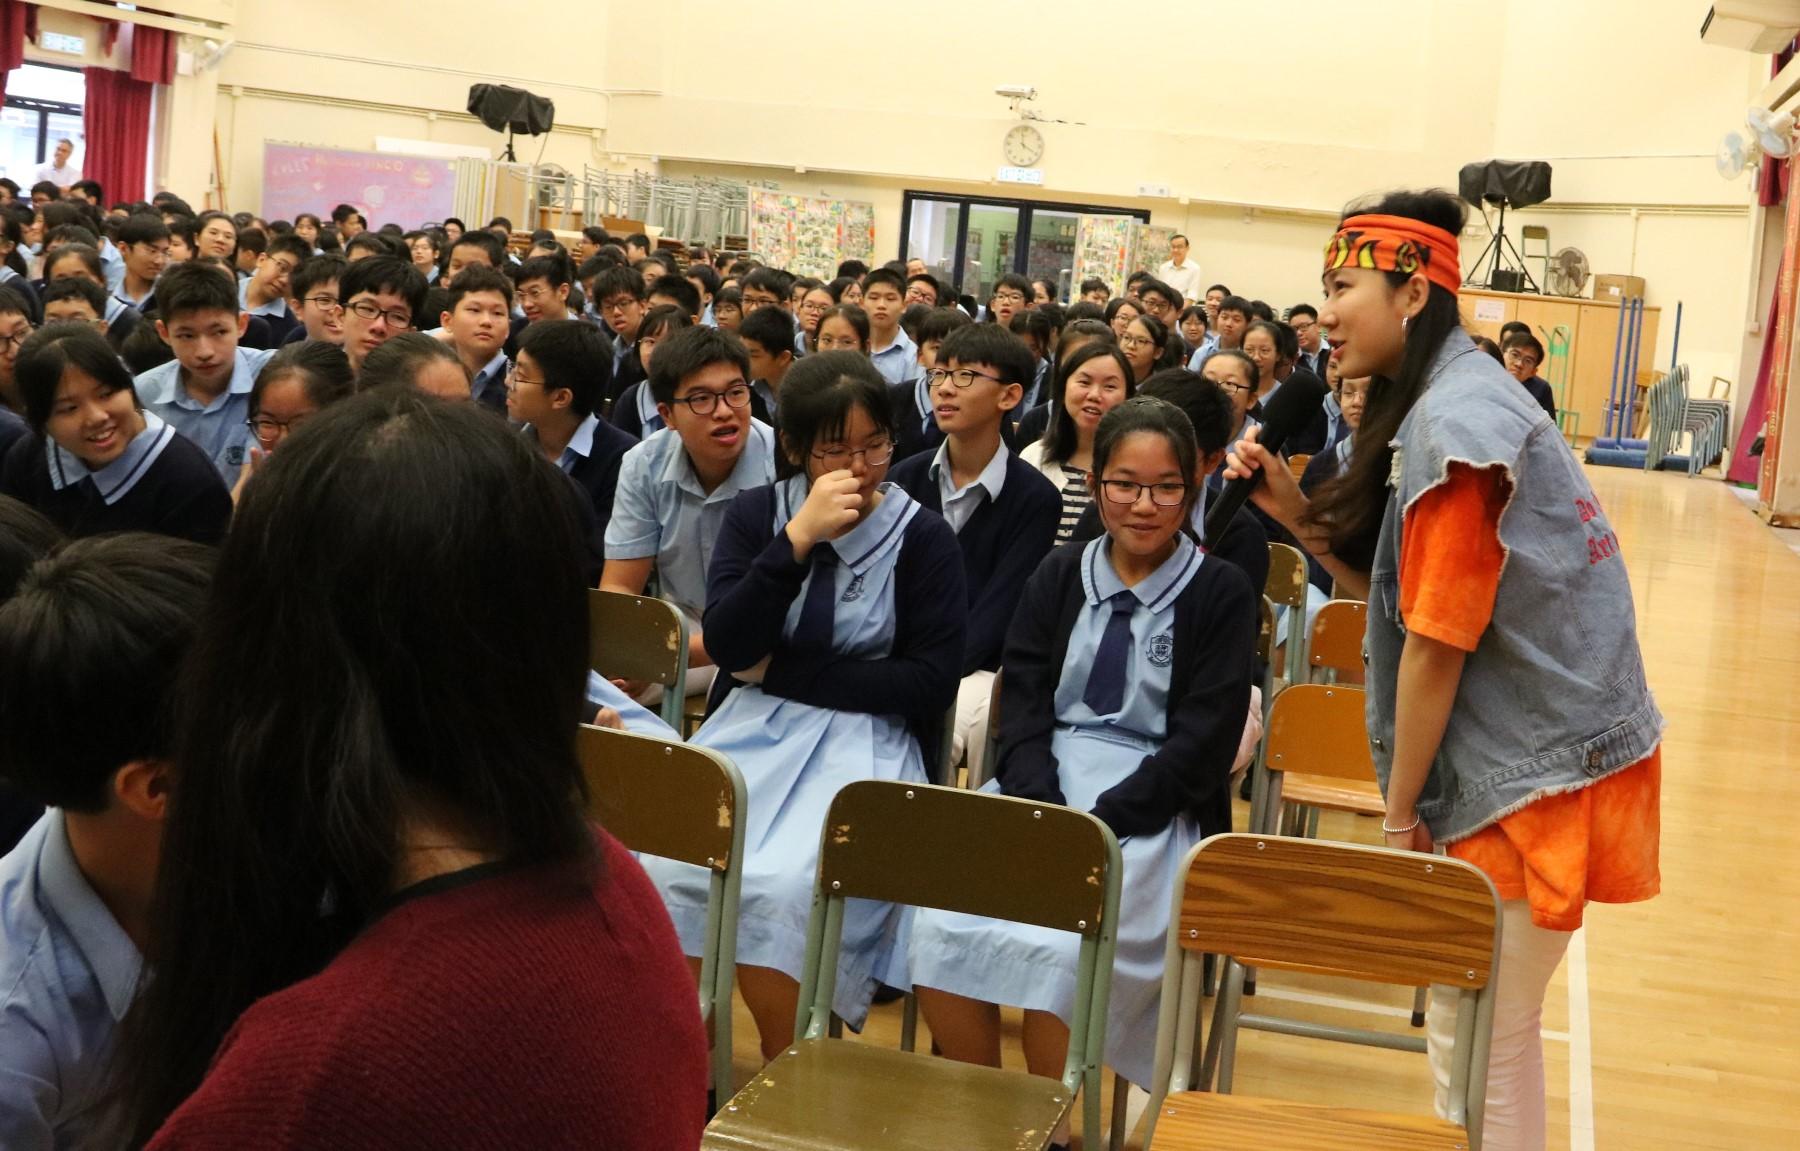 http://npc.edu.hk/sites/default/files/img_6890.jpg